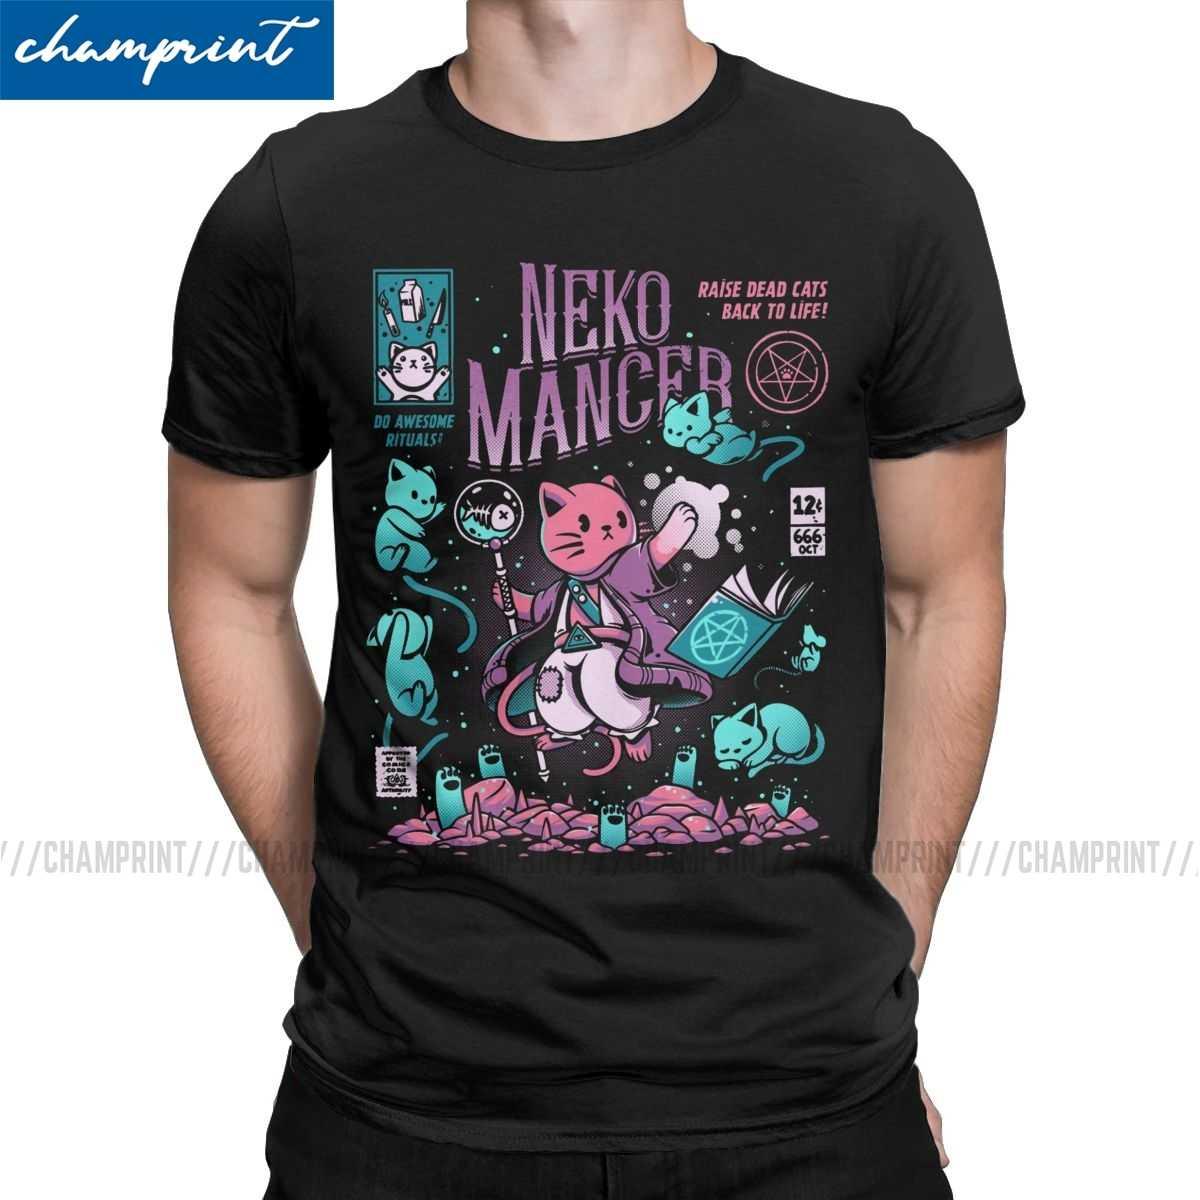 Neko Mancer T Shirt Women Casual Aesthetic Witch Satantic Gothic Goth Tops Nice